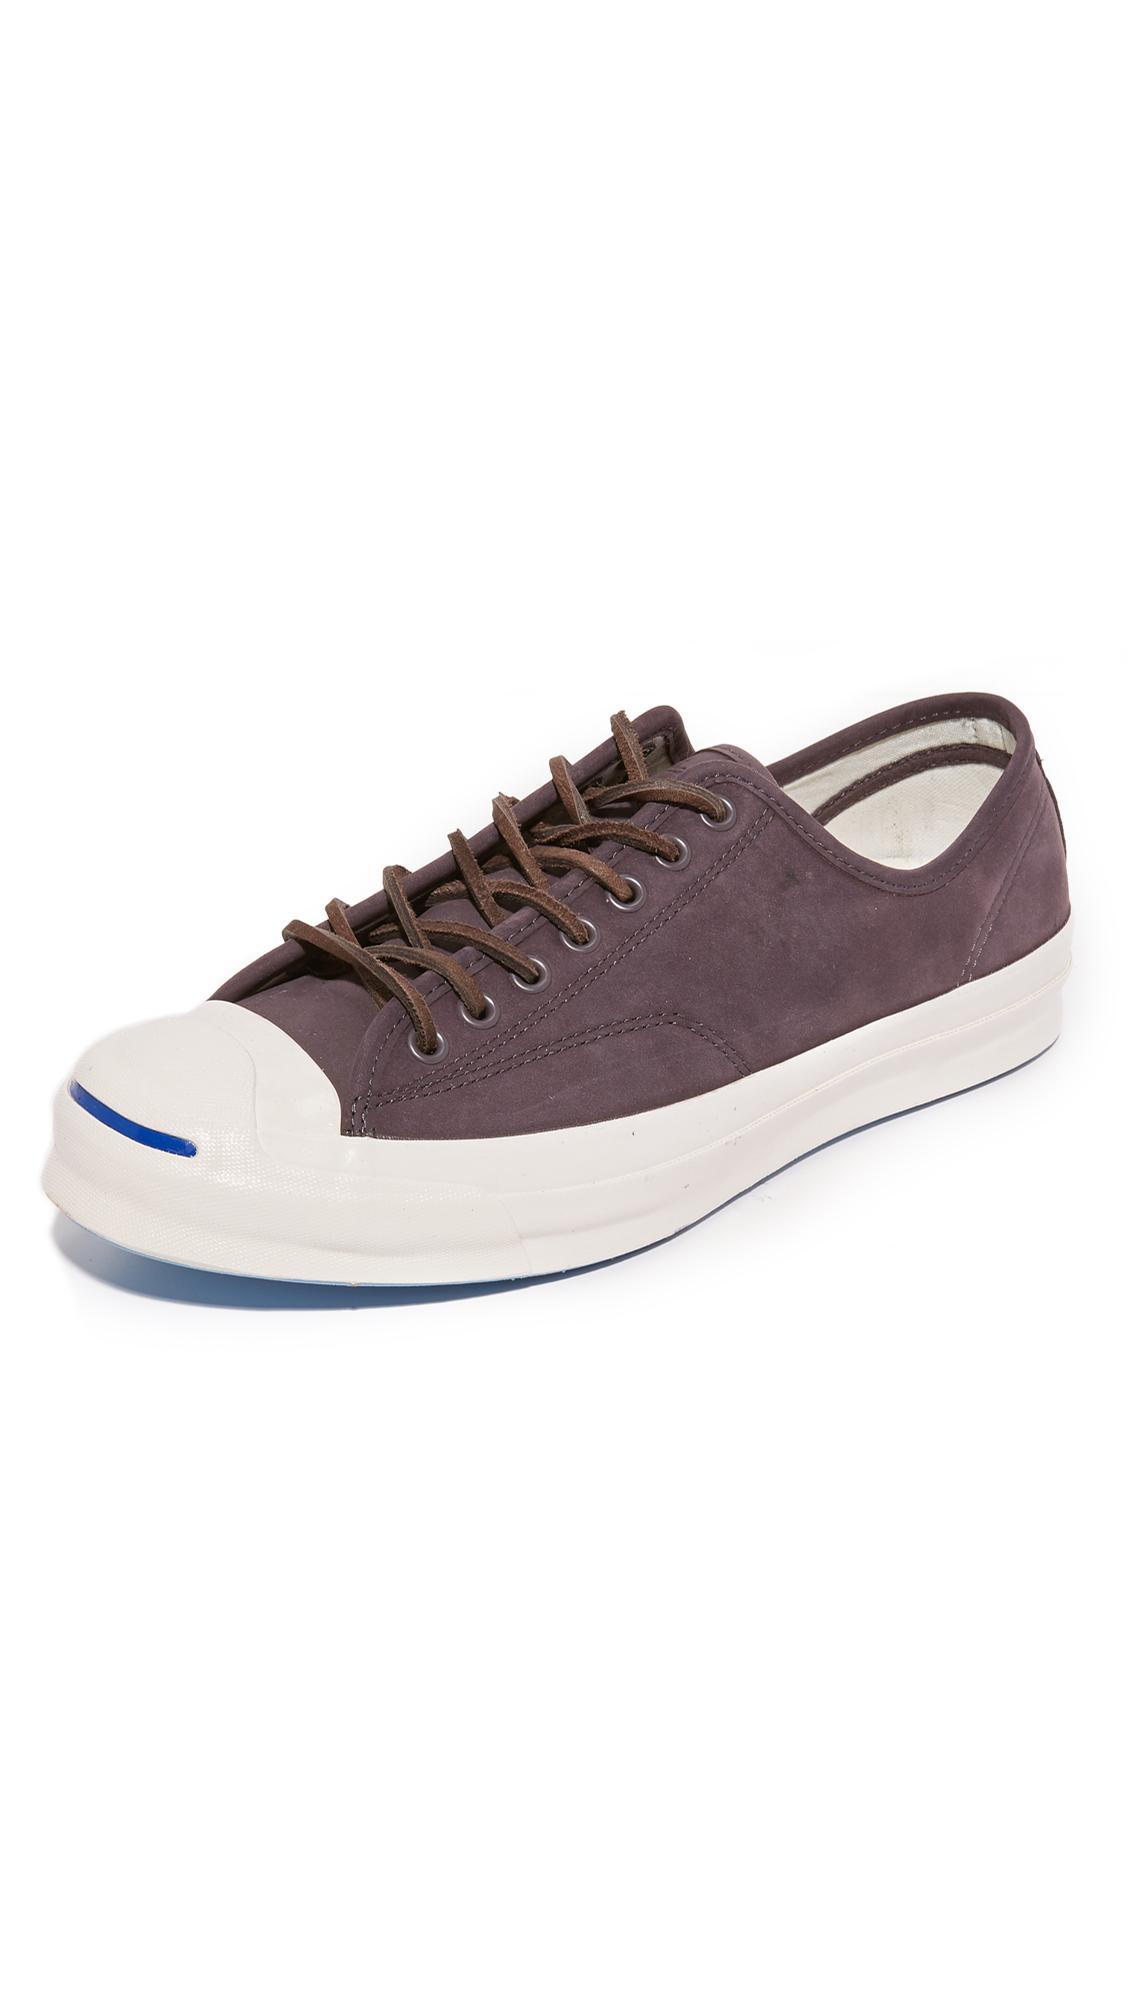 9b3f35a5d35794 Converse Jack Purcell Signature Nubuck Sneakers In Dusk Grey Dusk Grey Egret